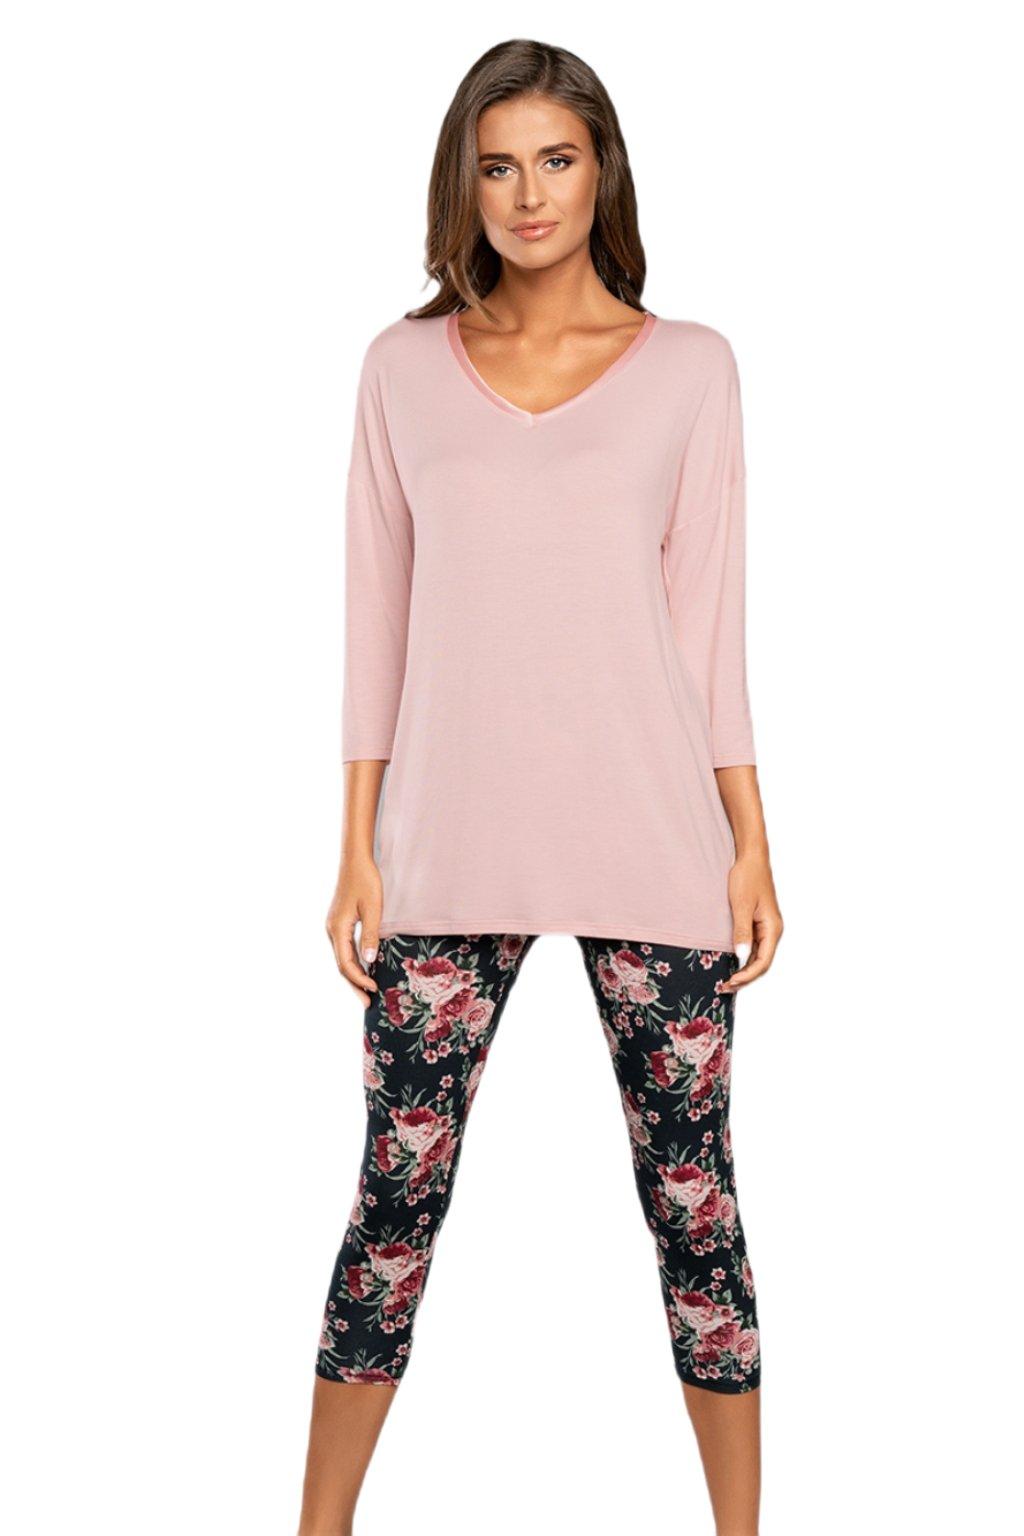 Dámské růžové pyžamo s 3/4 rukávem Italian Fashion Symfonia